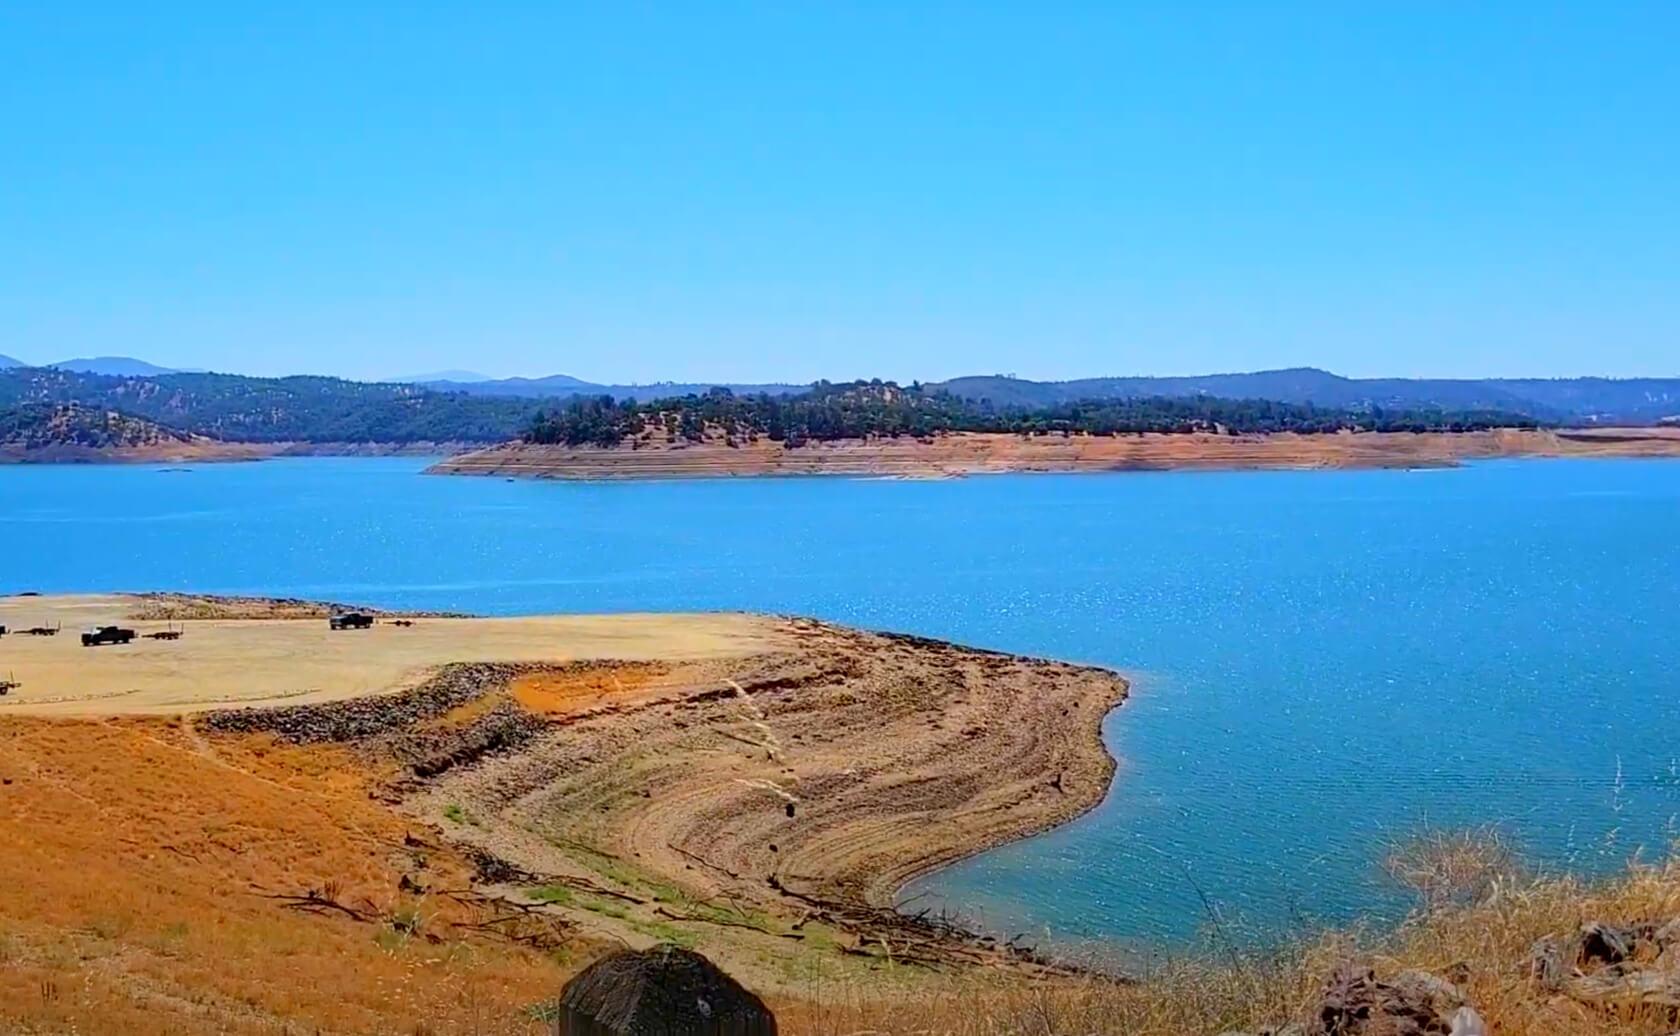 New-Melones-Lake-Fishing-Guide-Report-California-01